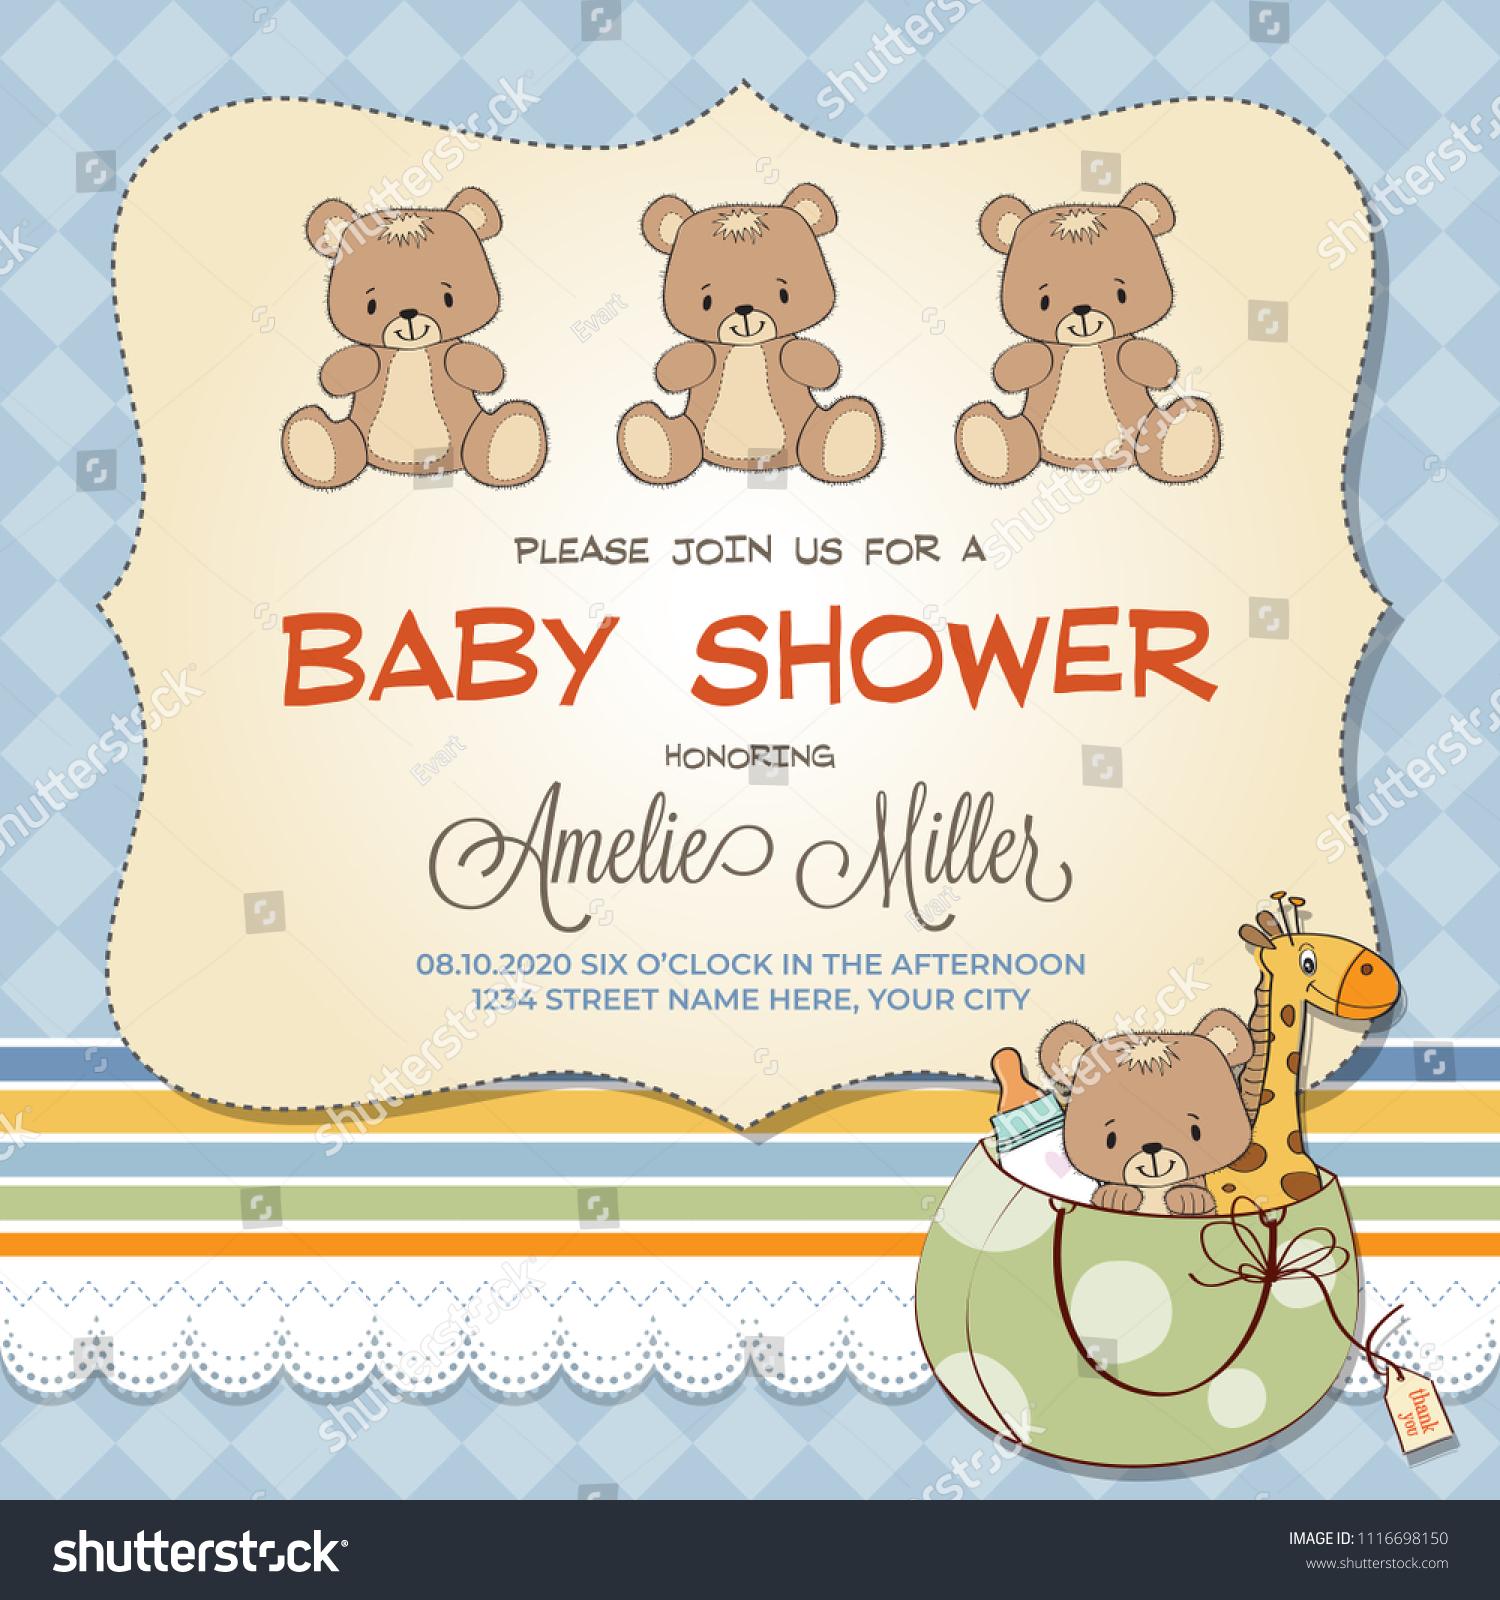 teddy bear invitations for baby shower